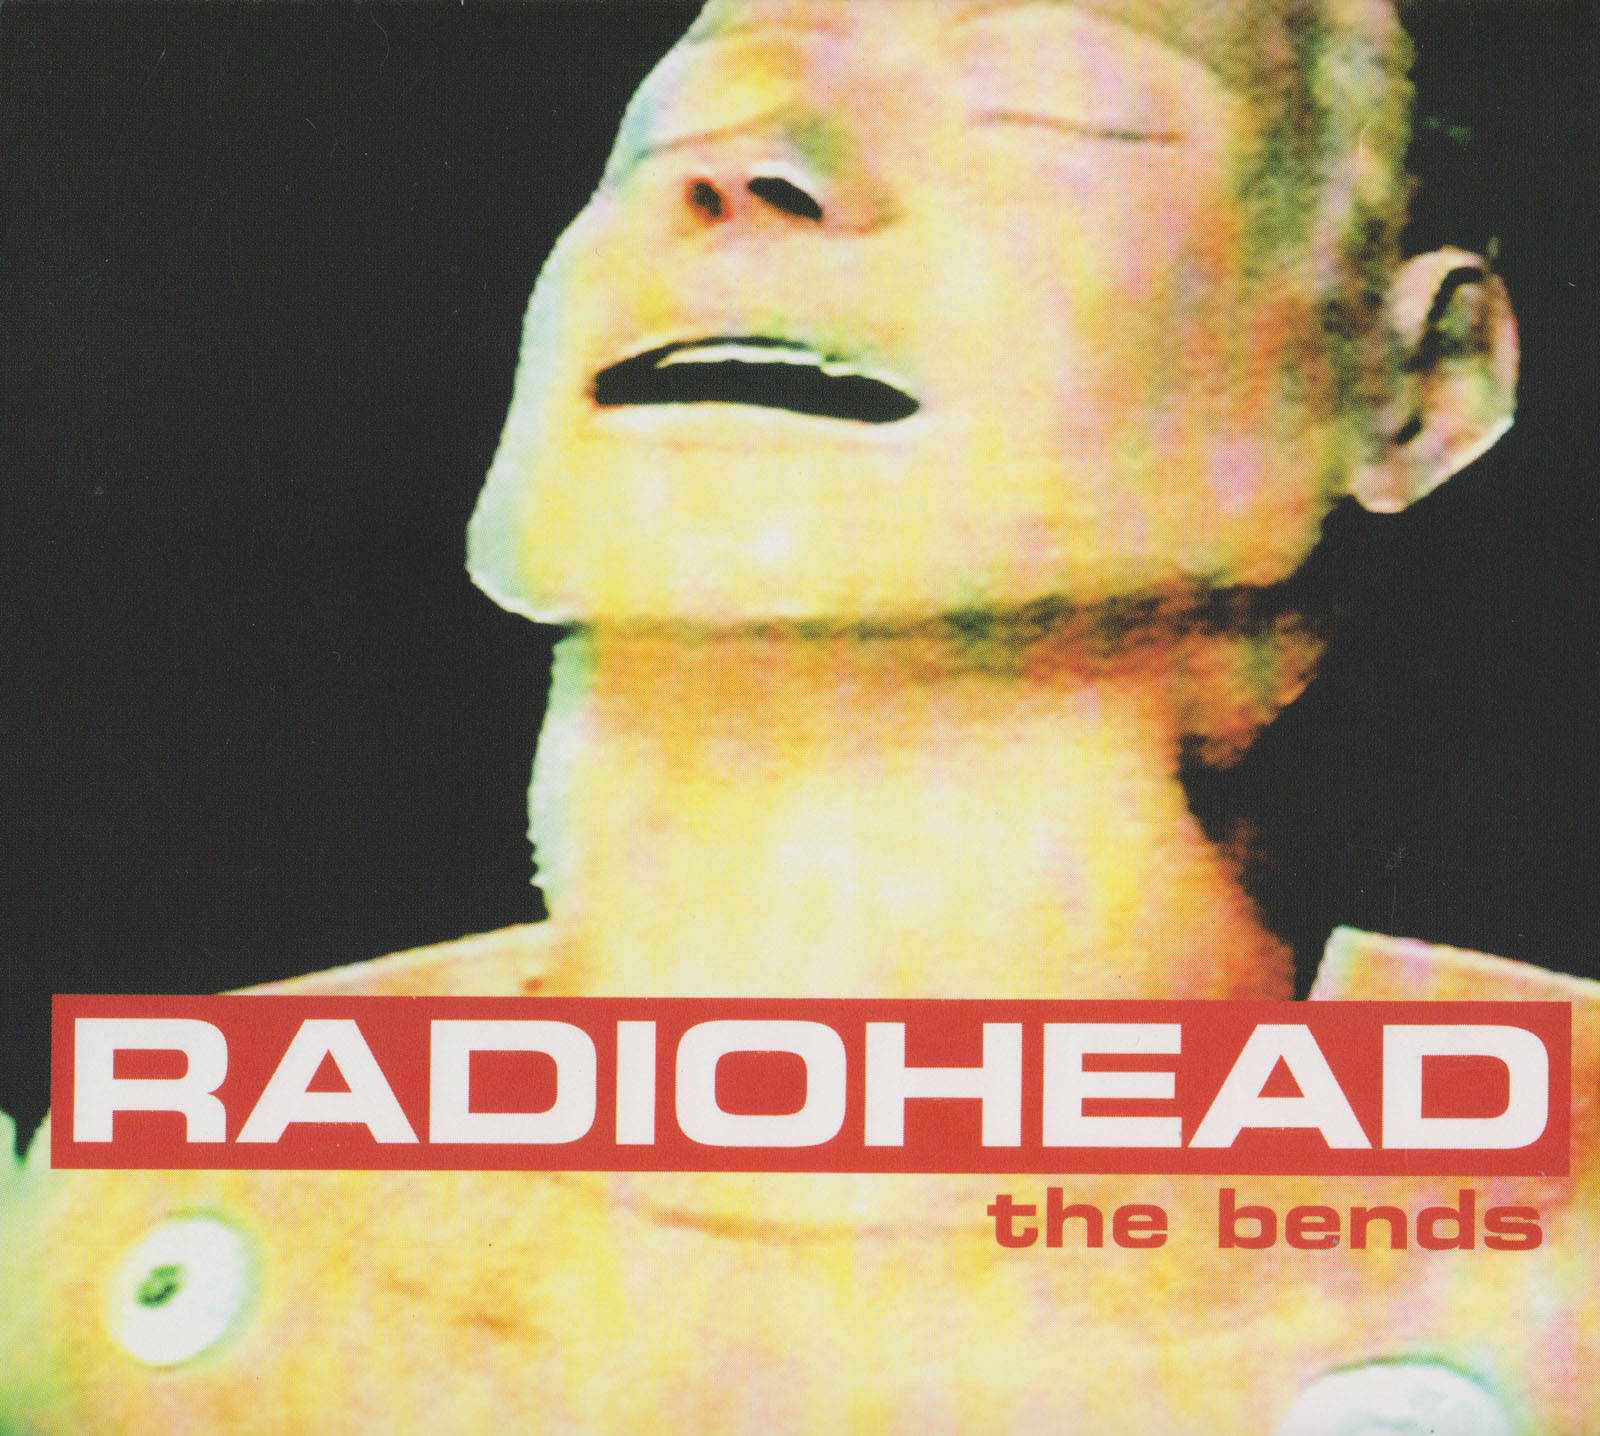 radiohead discography torrent flac